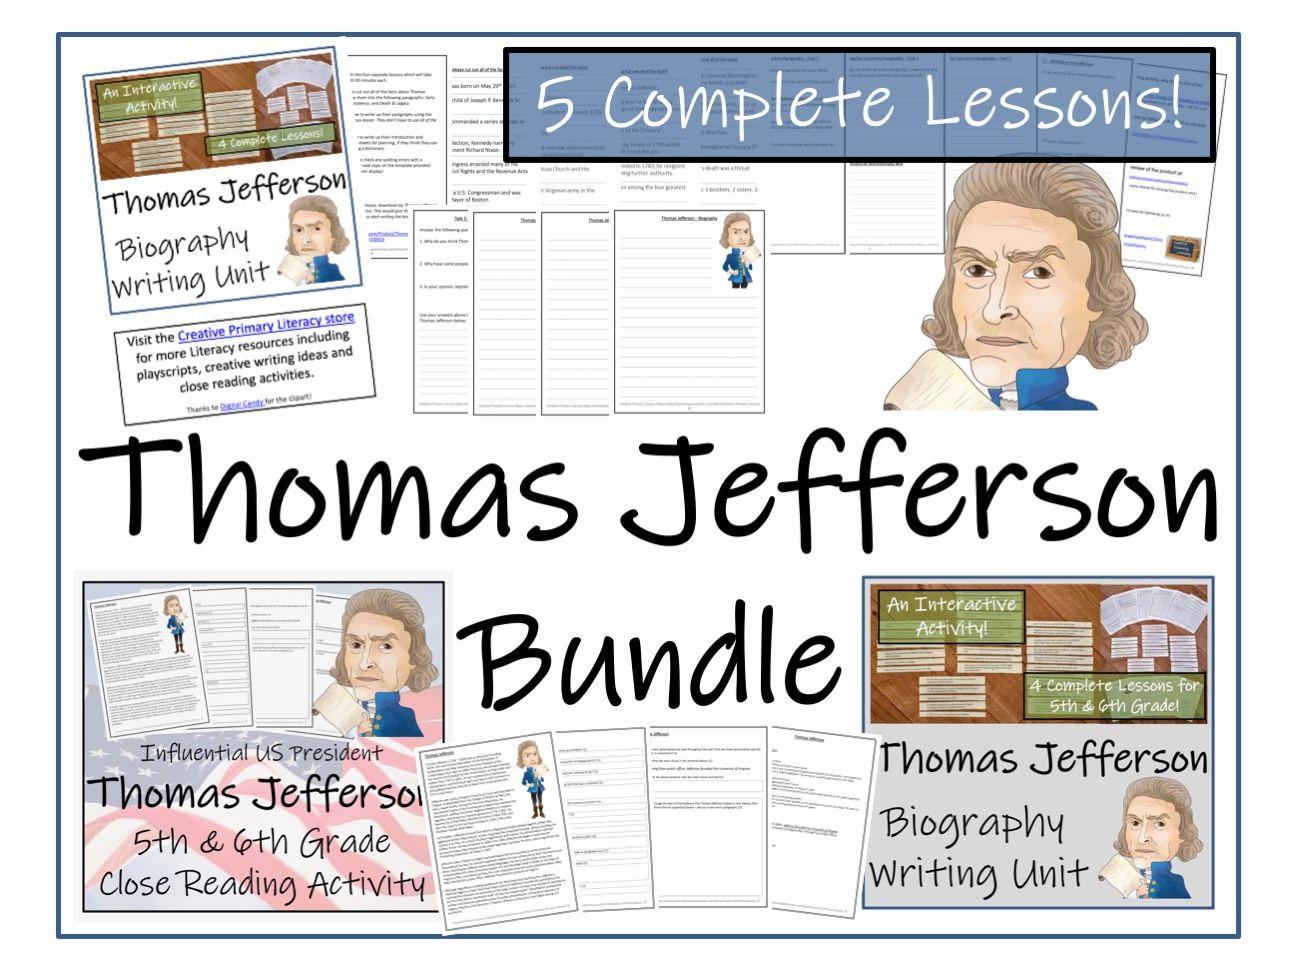 UKS2 History - Bundle of Activities about Thomas Jefferson